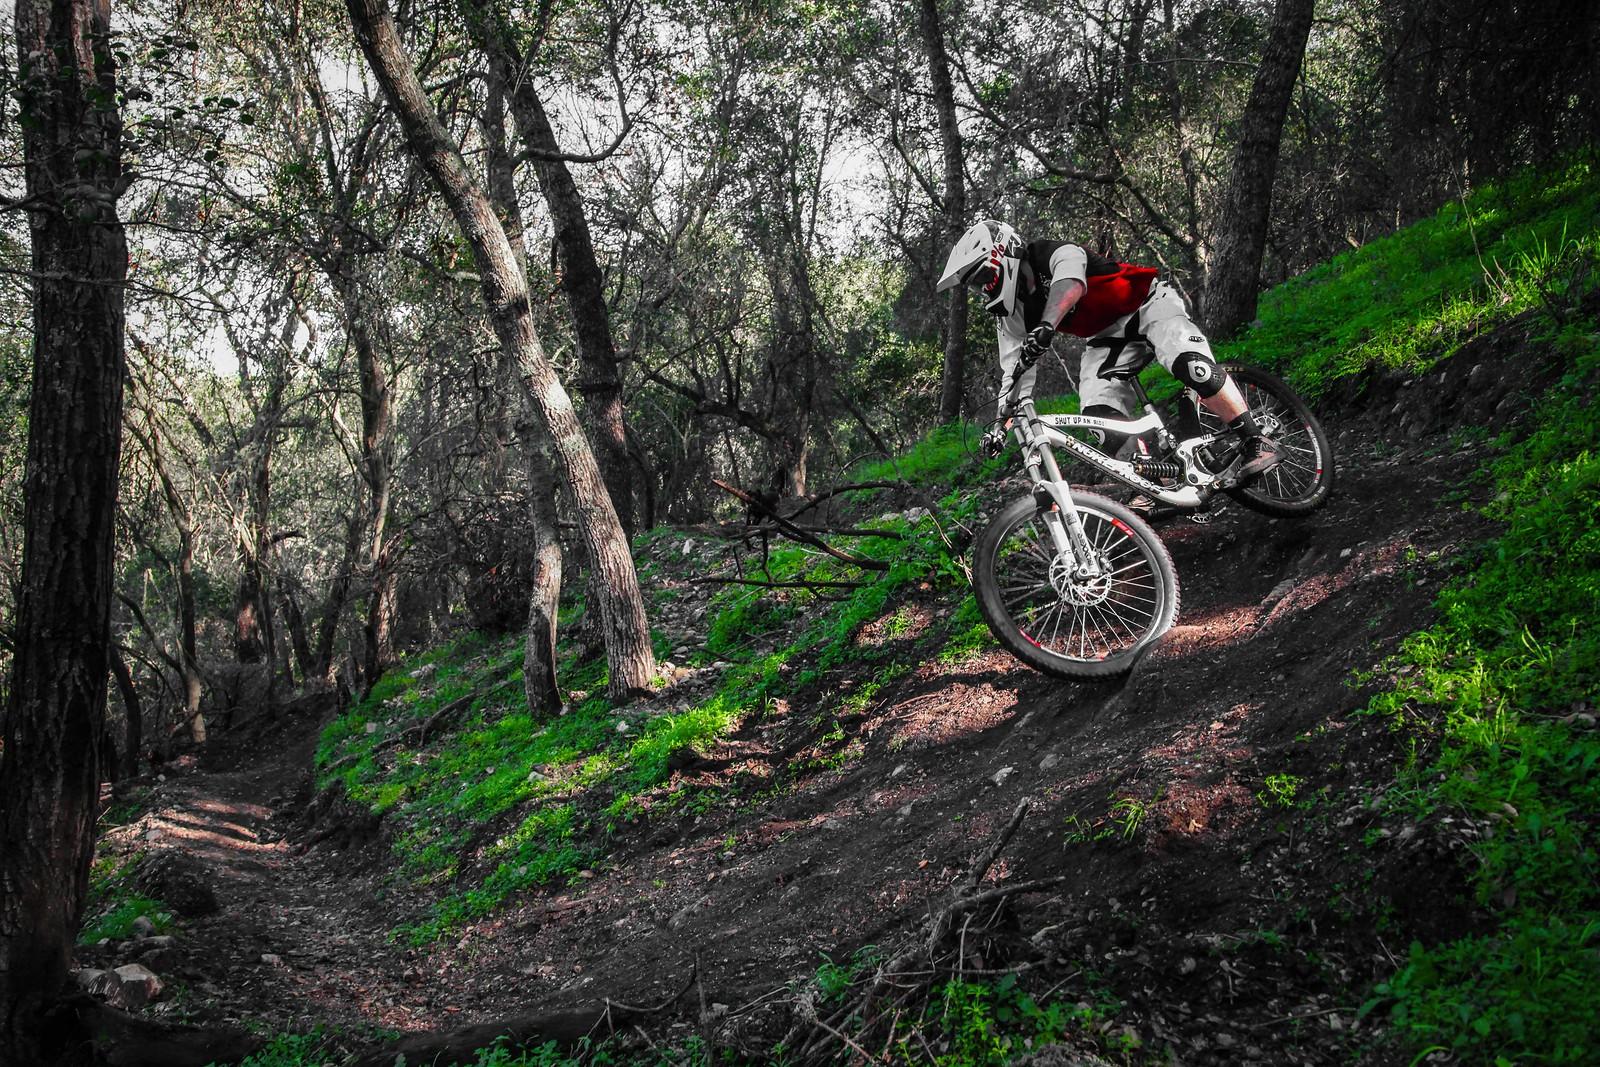 IMG 2640 - GnarHuck - Mountain Biking Pictures - Vital MTB